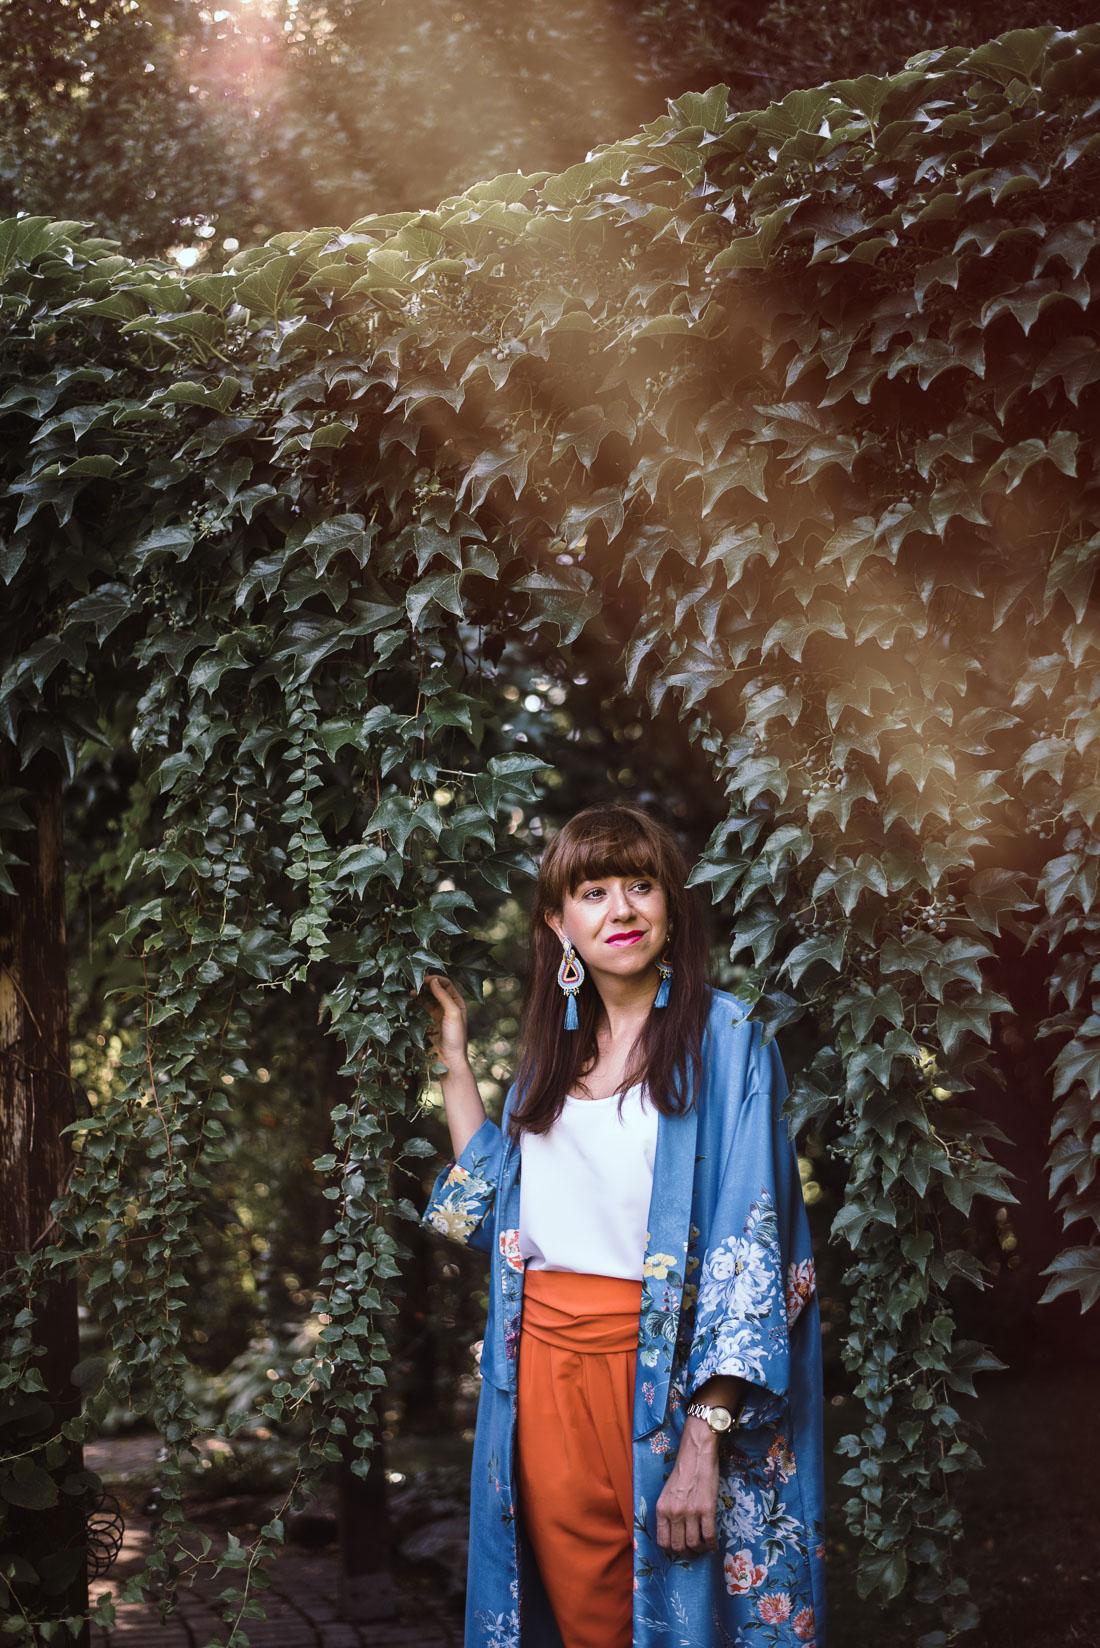 NOVÝ BYT, NOVÉ MOŽNOSTI_Katharine-fashion is beautiful_blog 1_Náušnice Bazu_Kvetinové kimono ZARA_Katarína Jakubčová_fashion blogerka